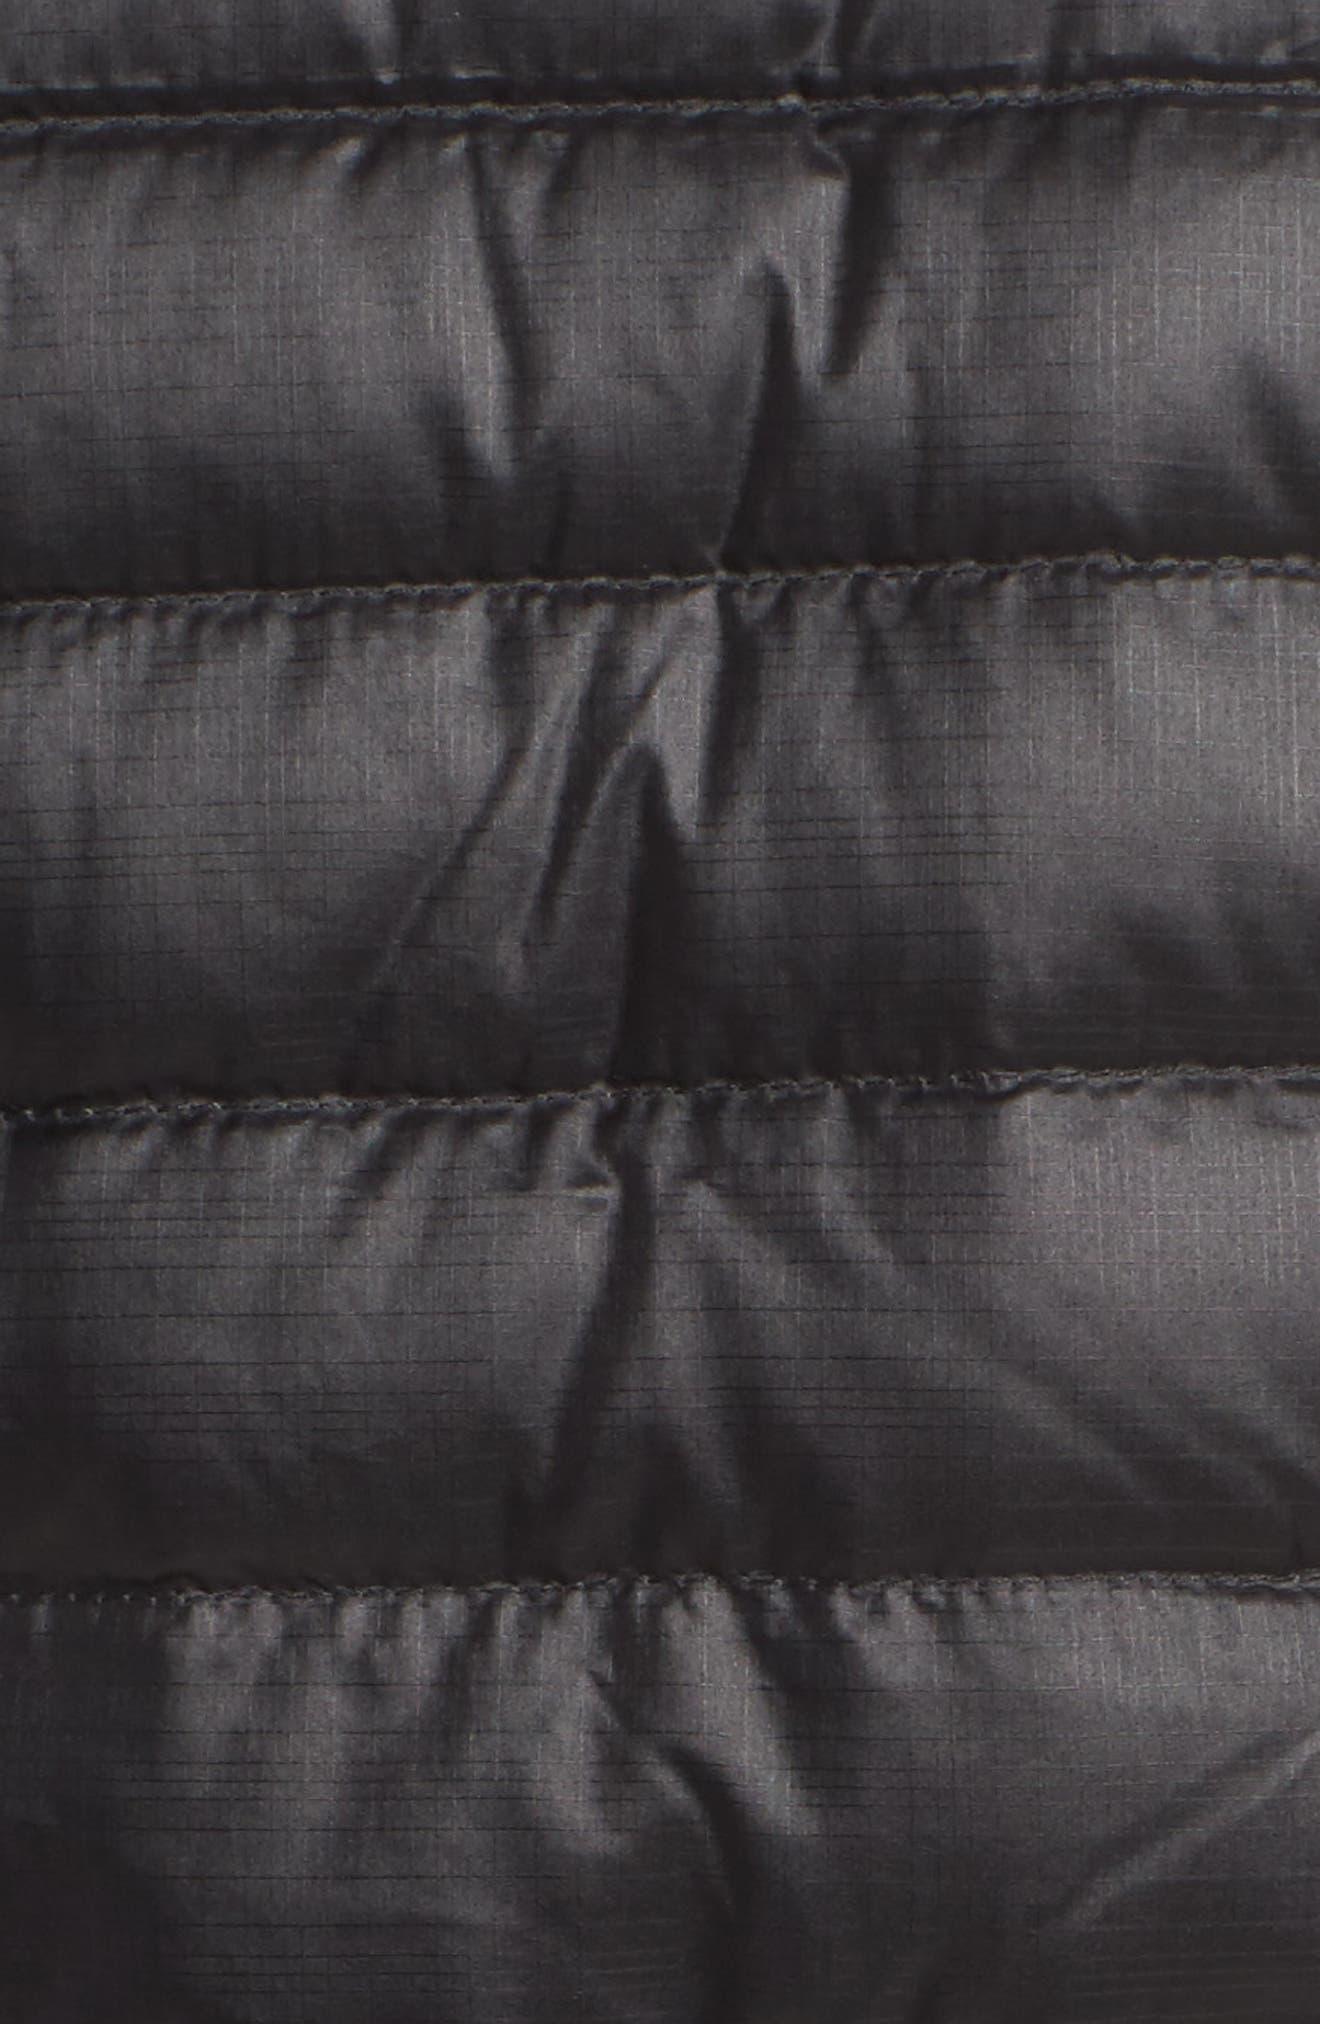 Verglas Hybrid Down Insulator Jacket,                             Alternate thumbnail 7, color,                             001